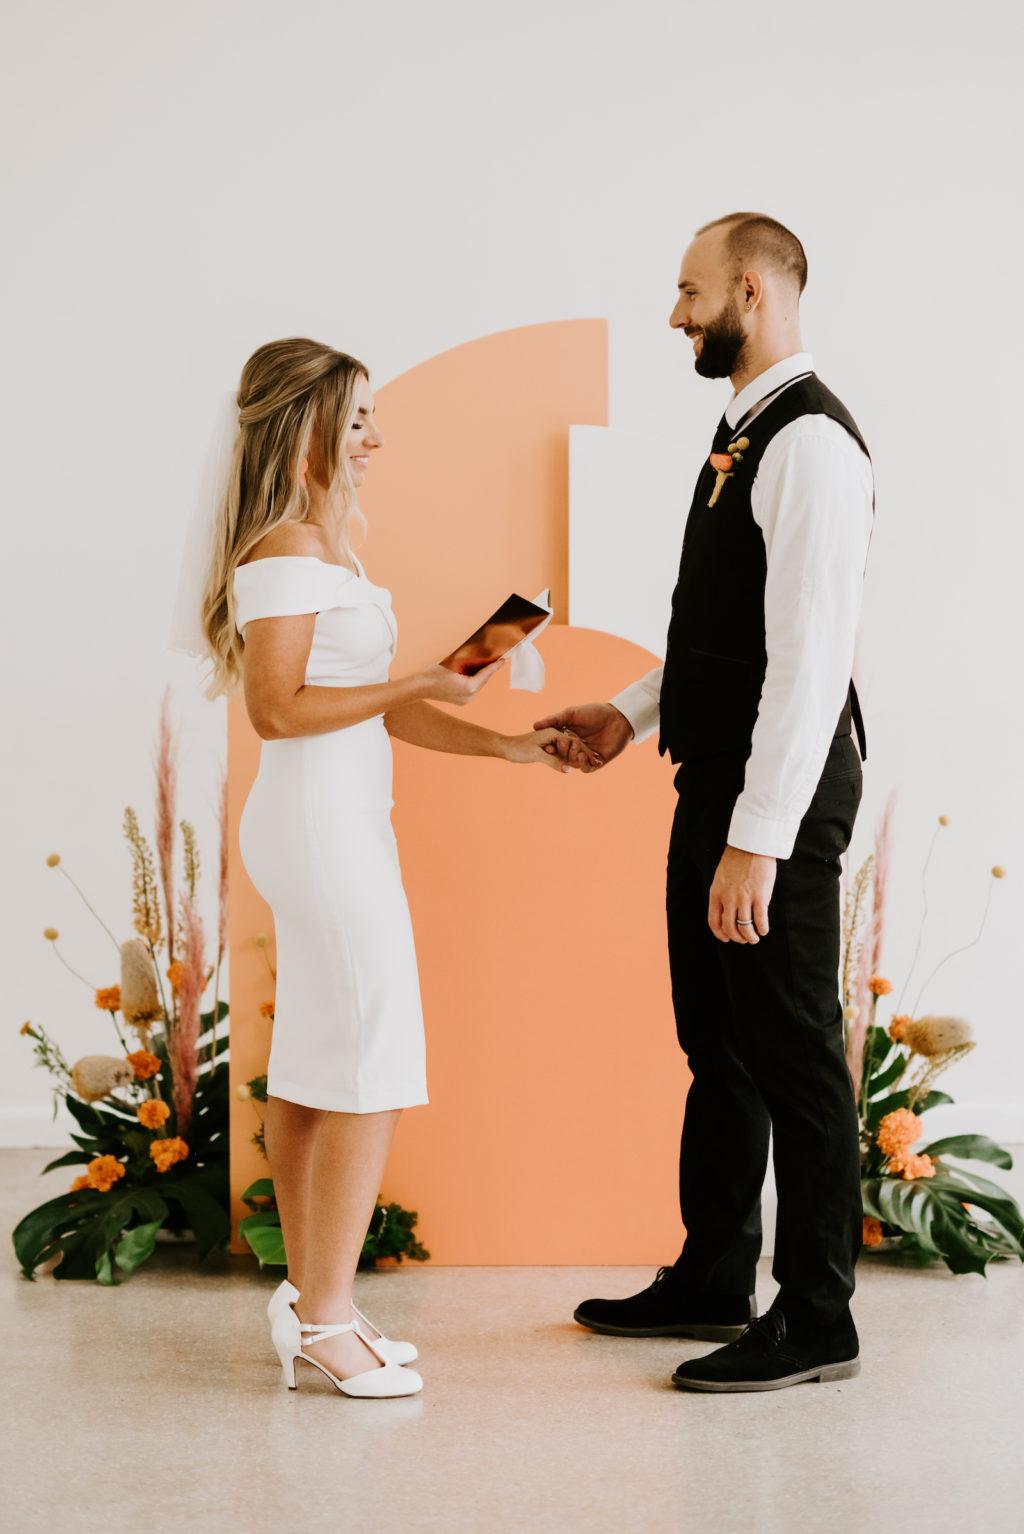 Retro Mid Century Modern Wedding Ceremony Bride and Groom Exchanging Wedding Vows, Orange and White Geometric Arch, Monstera Palm Leaves, Orange Marigolds, Pampas Grass Flower Arrangements